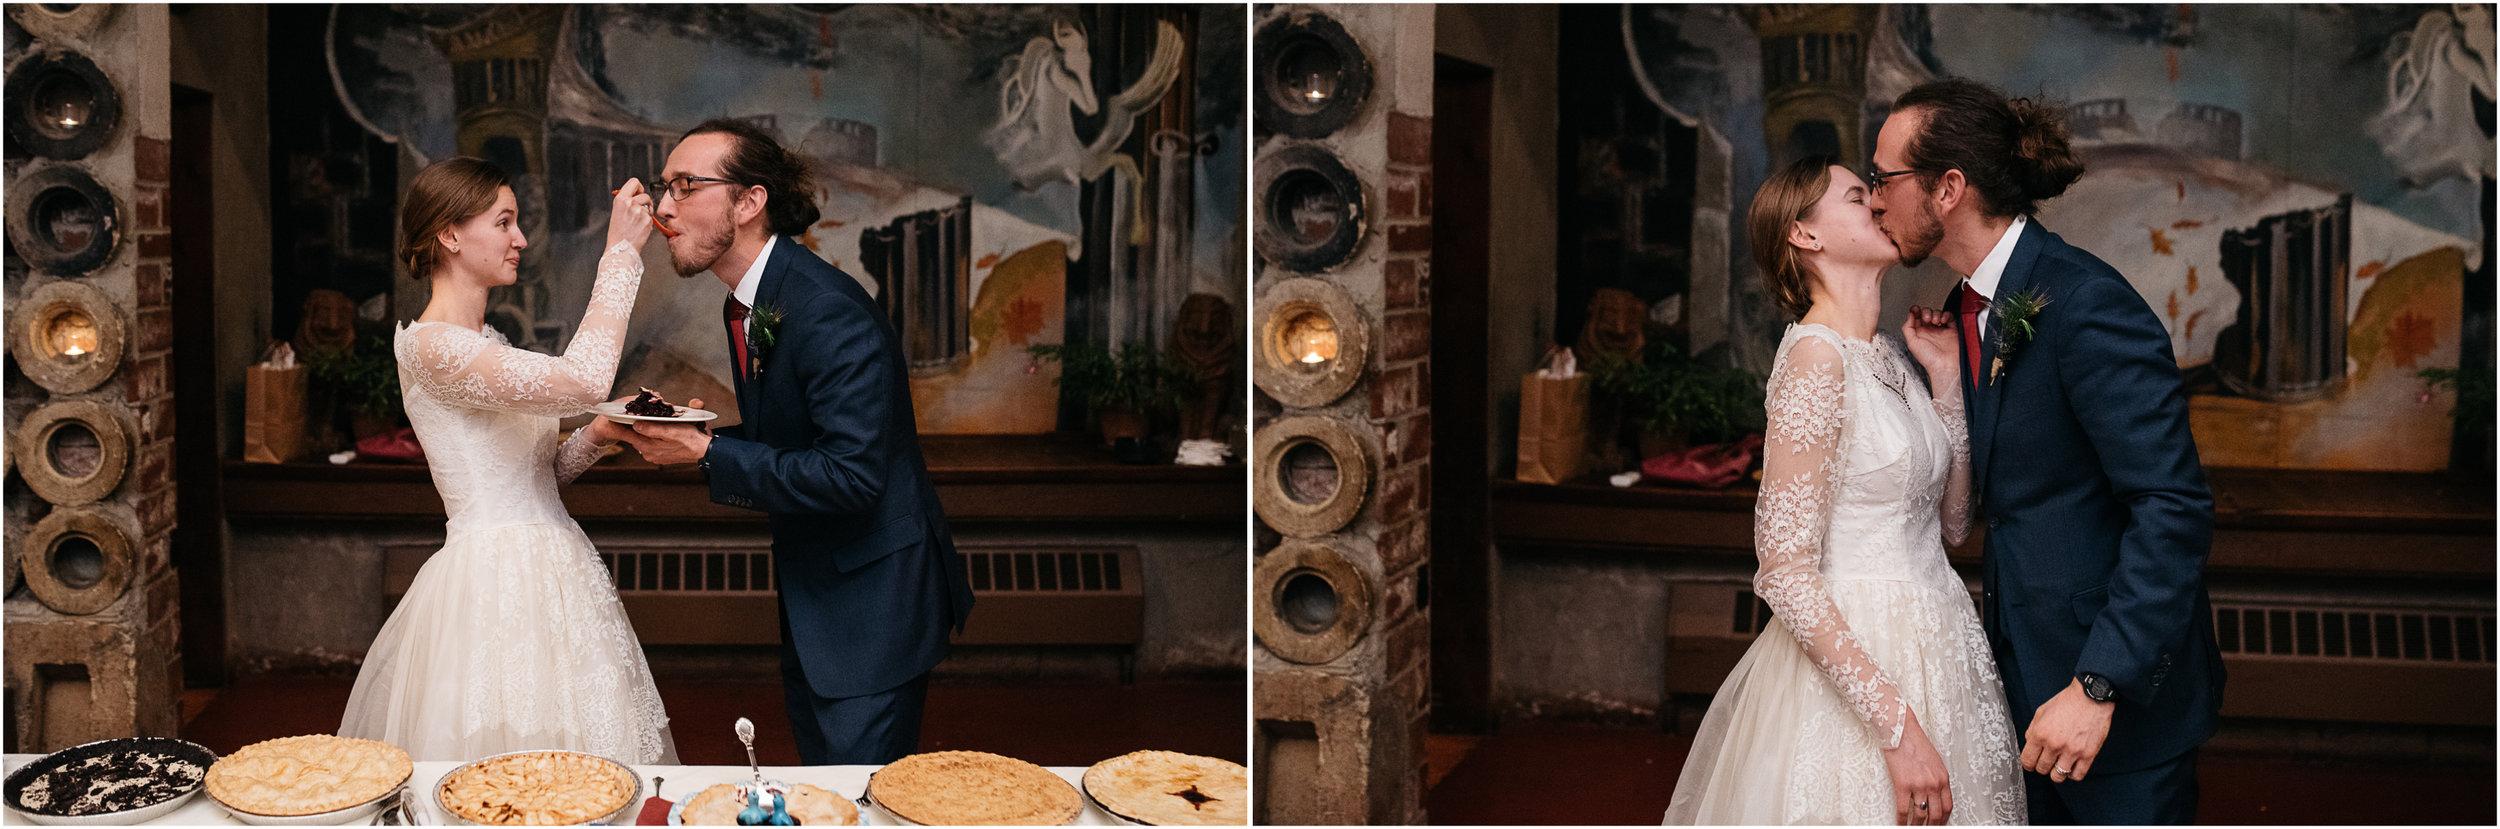 cake cutting Green Gables wedding photographer, Mariah Fisher Photography.jpg